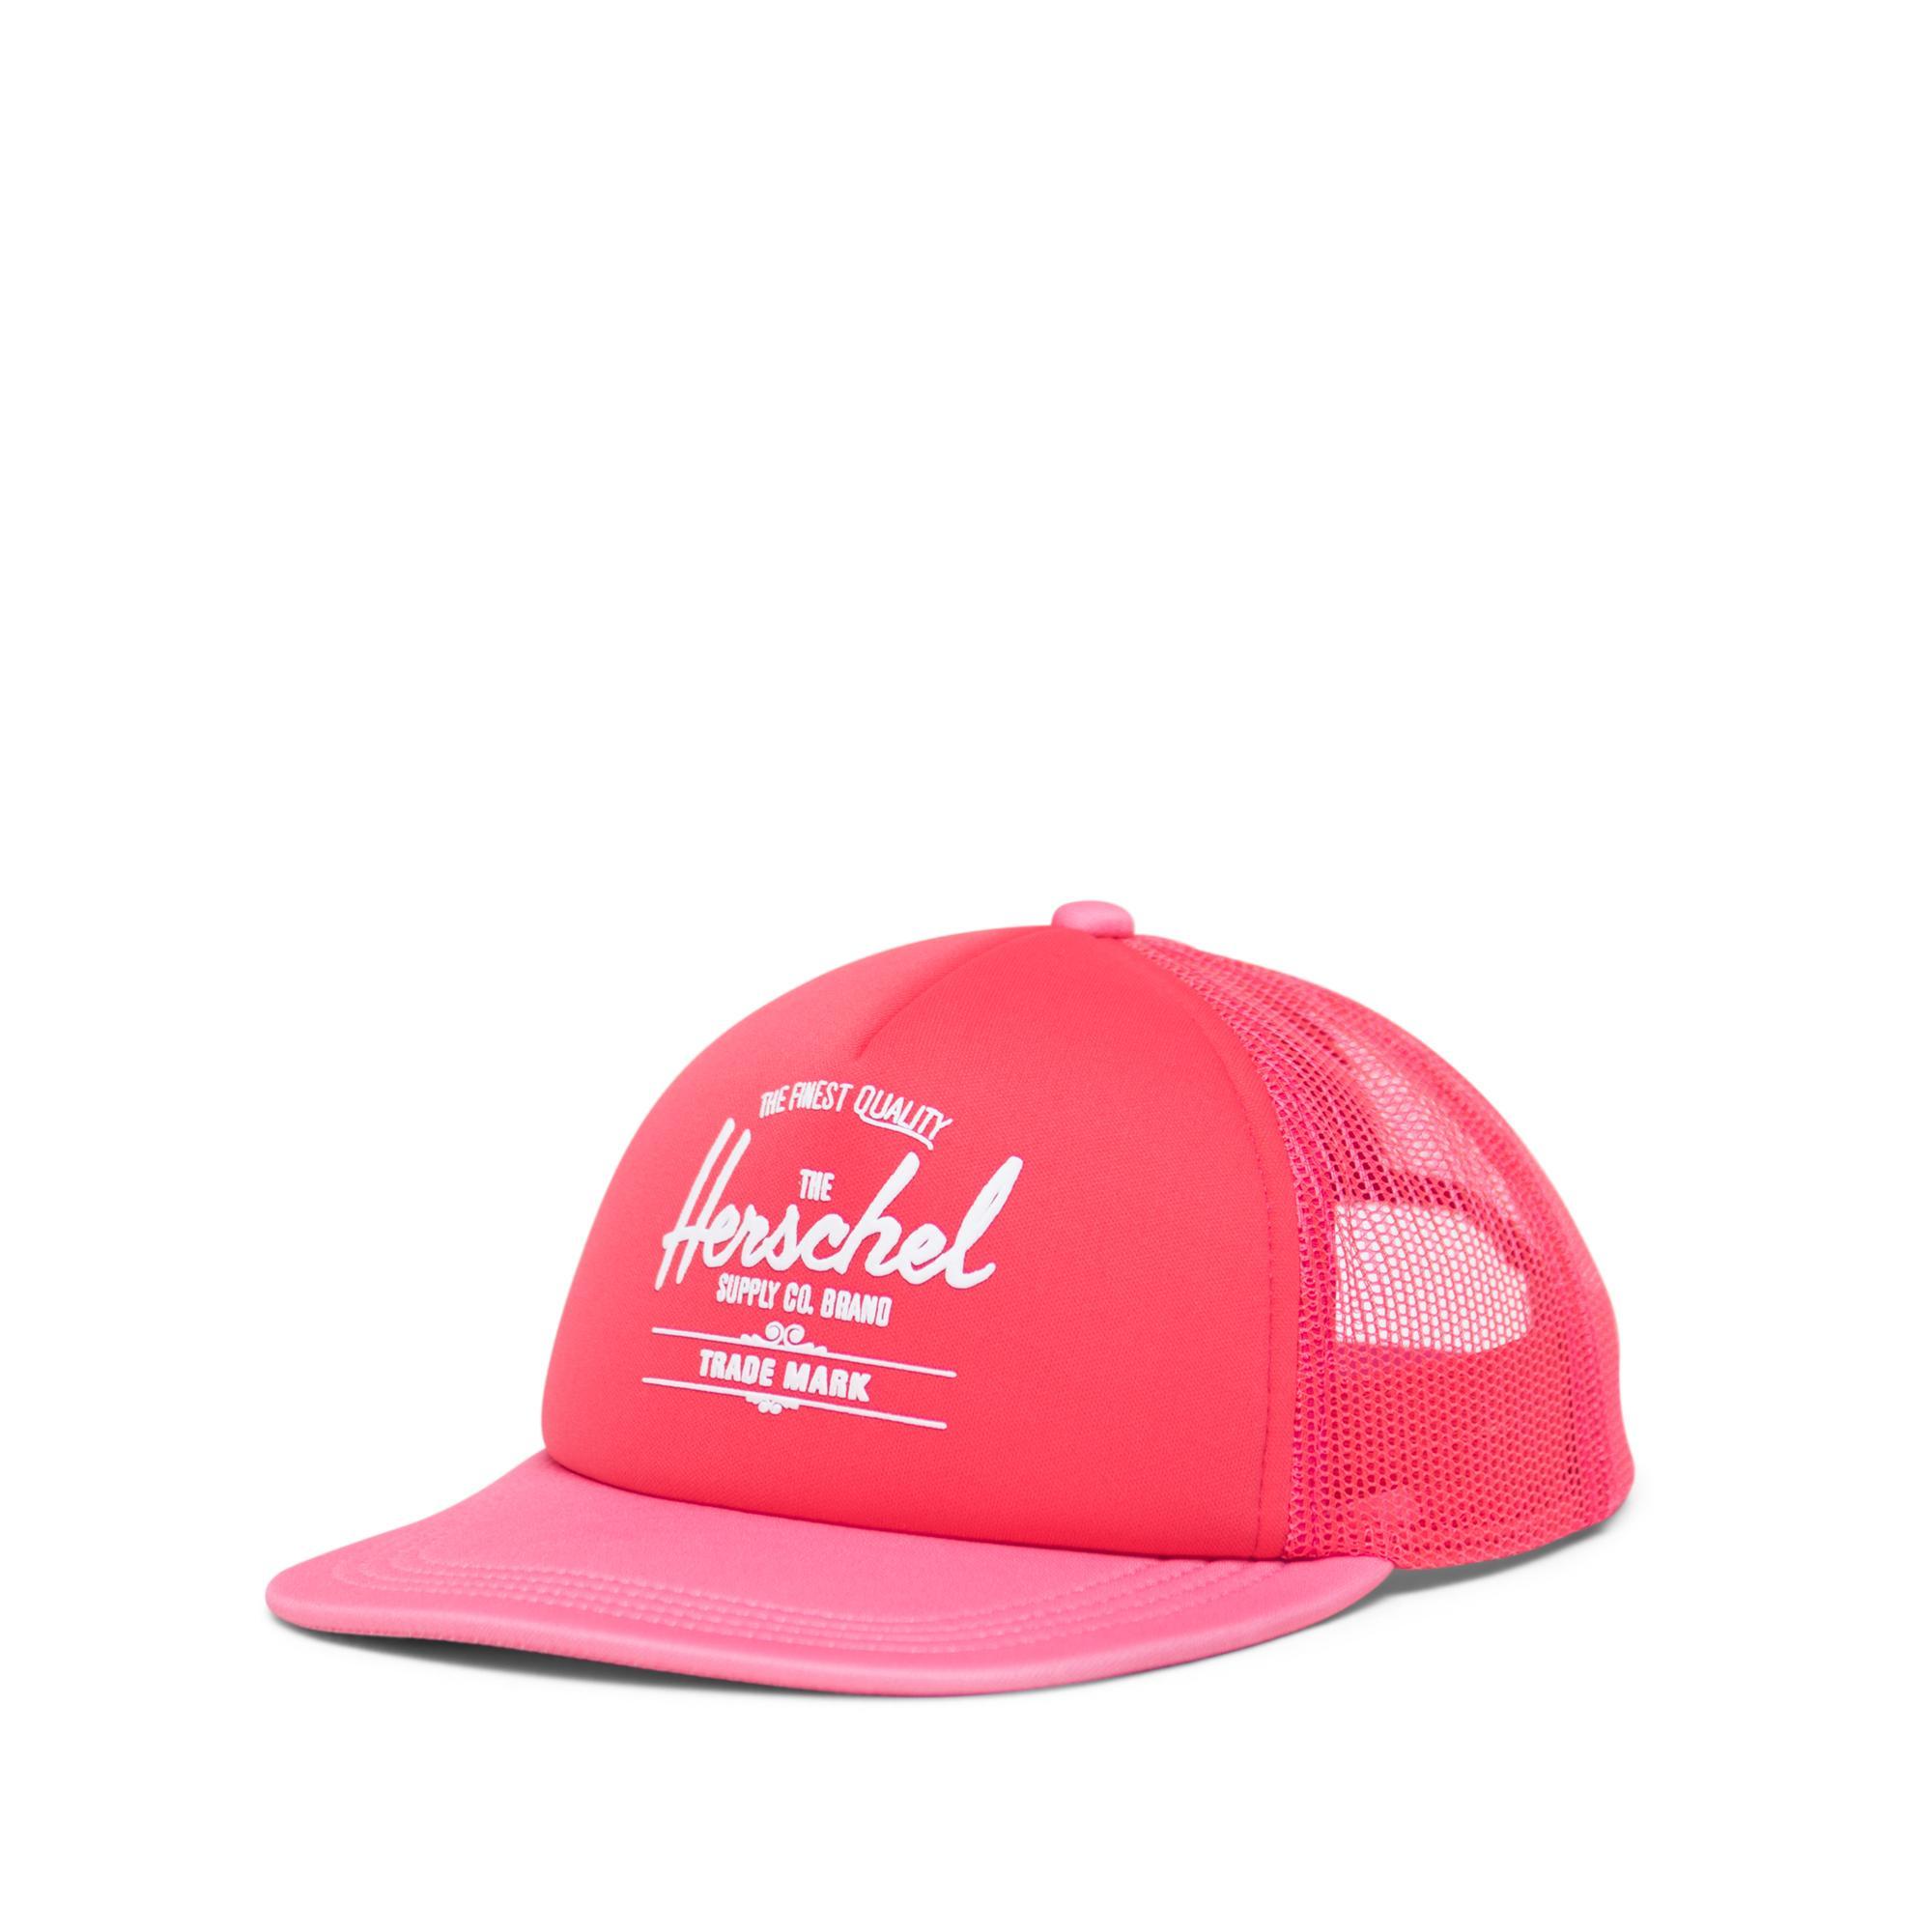 577d30fb Whaler Cap Mesh Soft Brim Youth | Herschel Supply Company